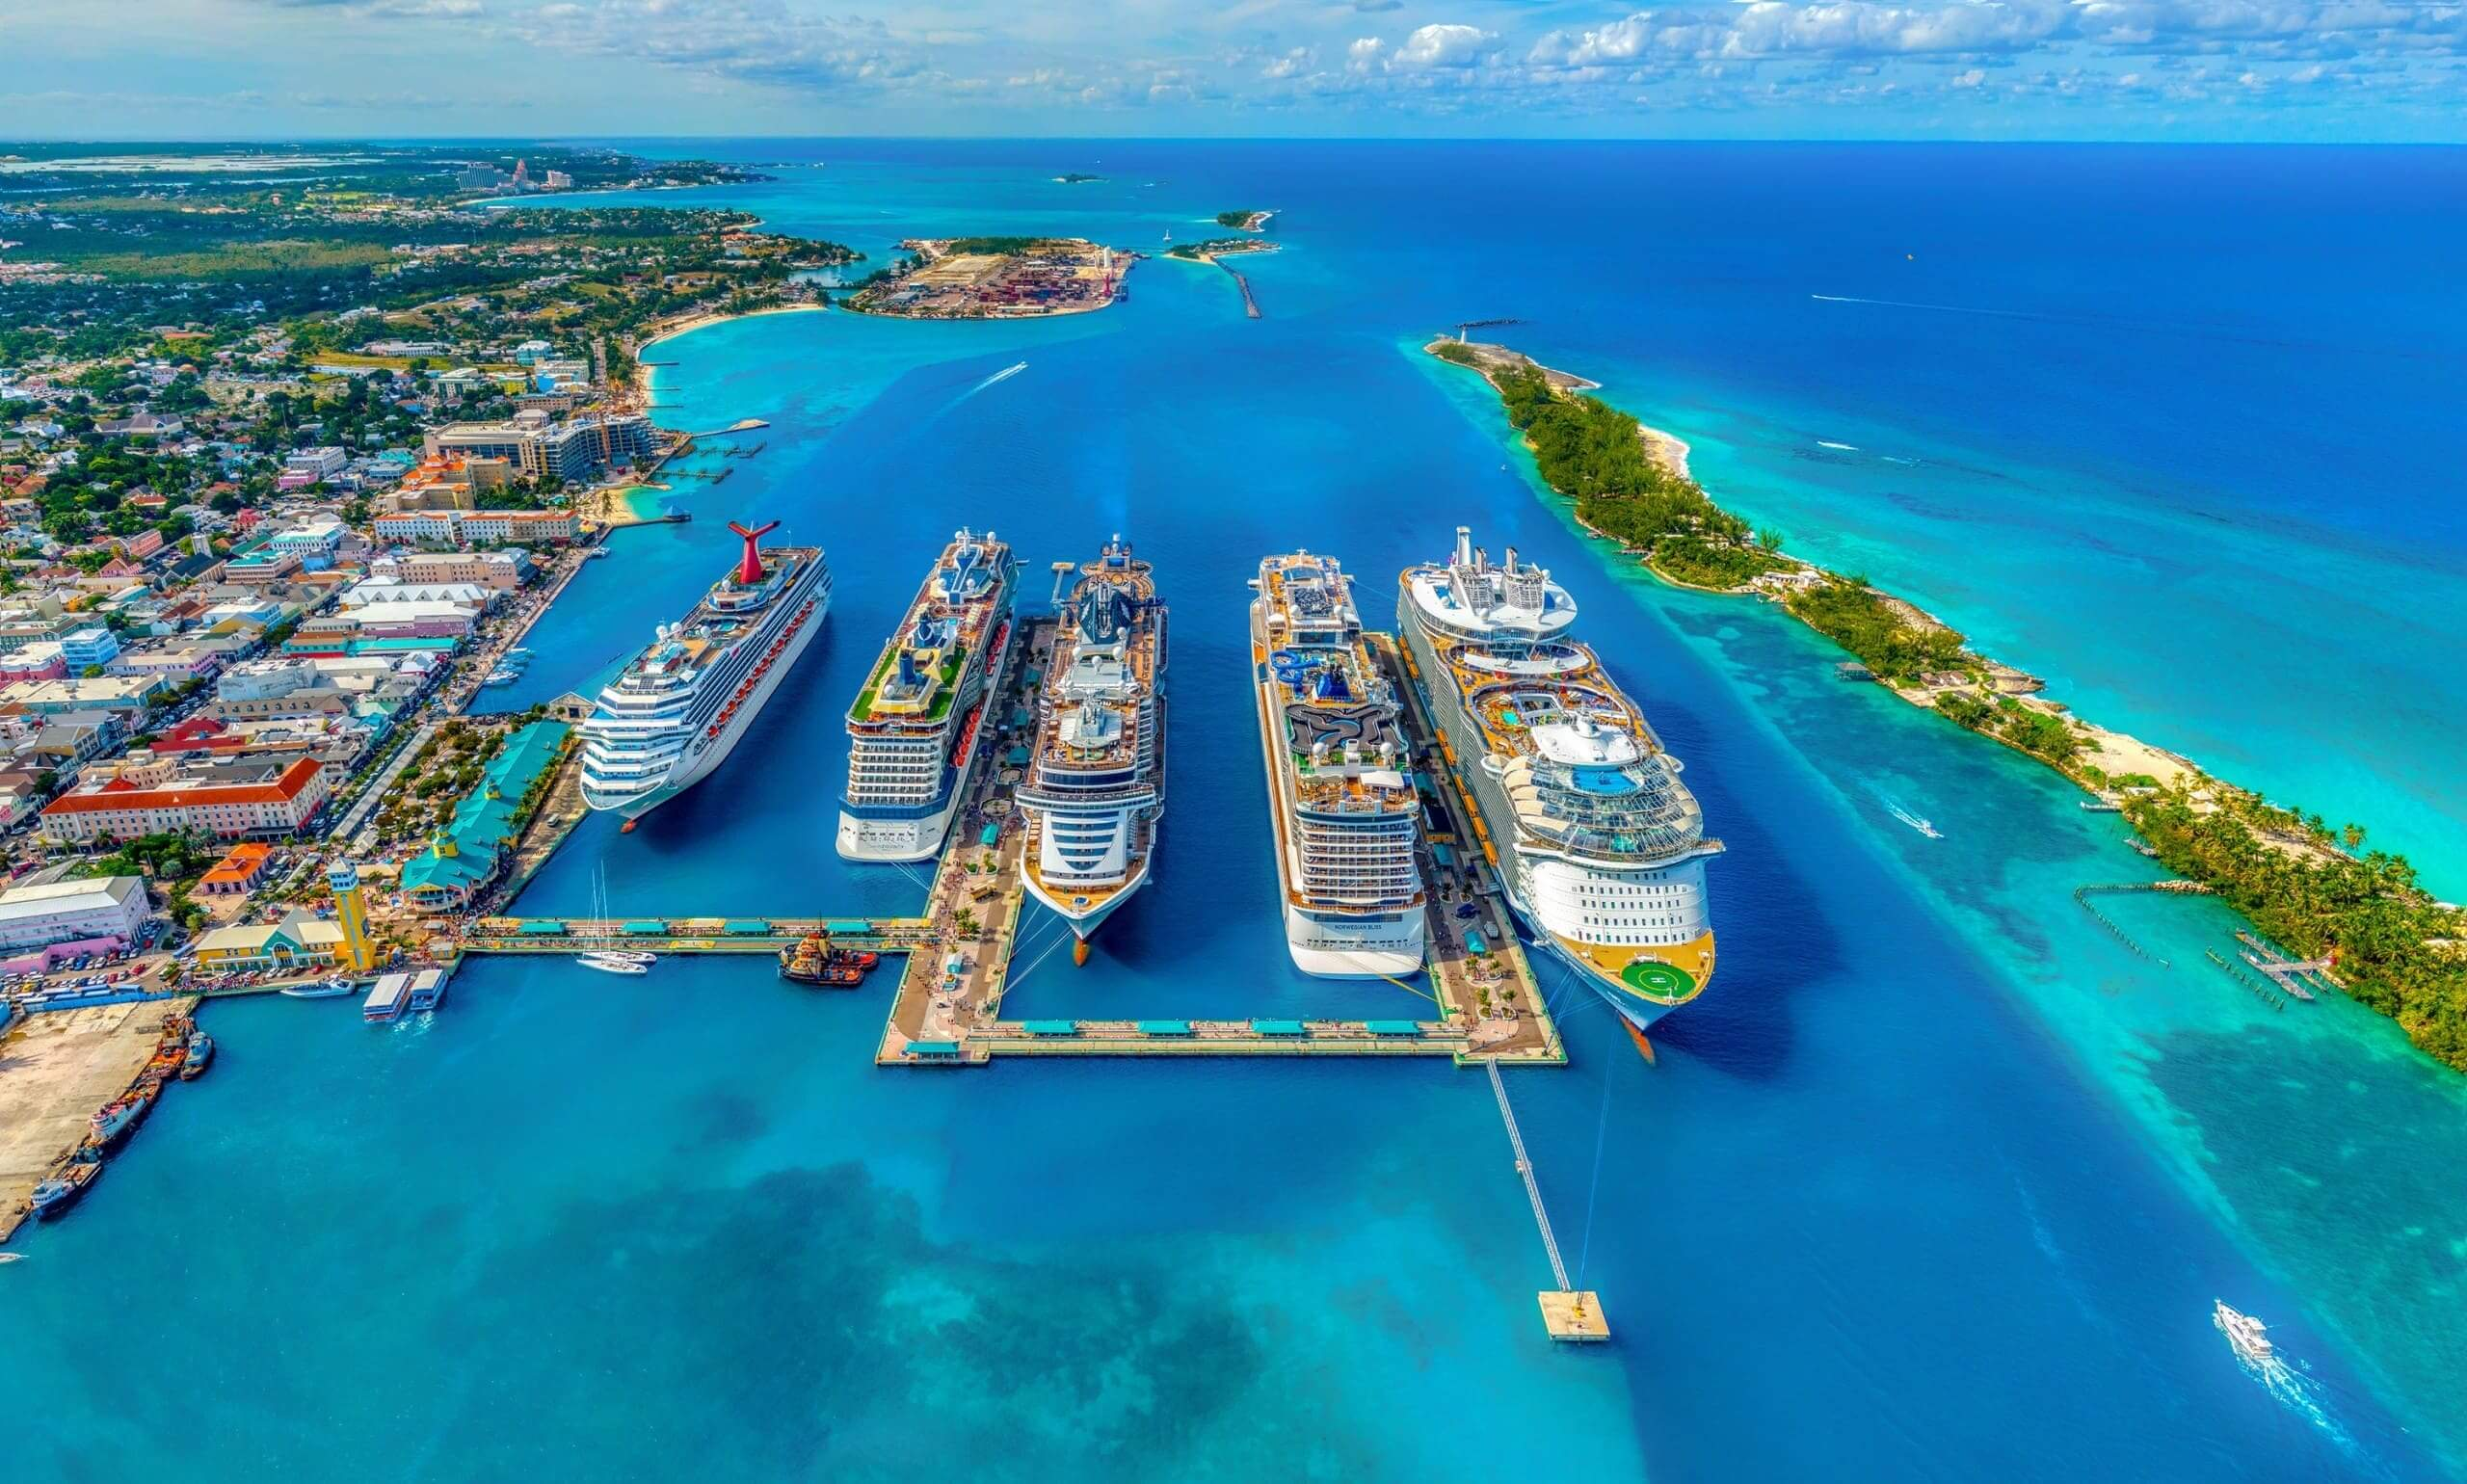 bahamas emiratos arabes residentes viajar